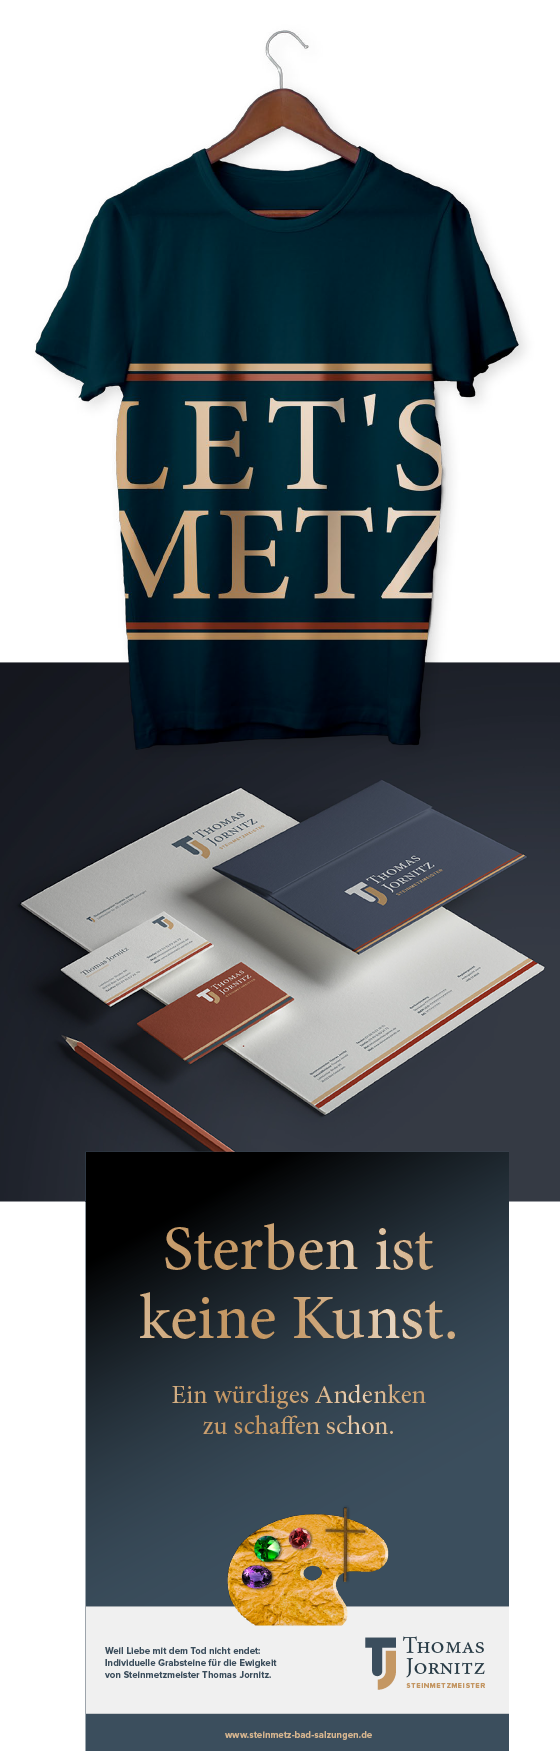 Samt&Seidel_Referenz_Jornitz_Design_03